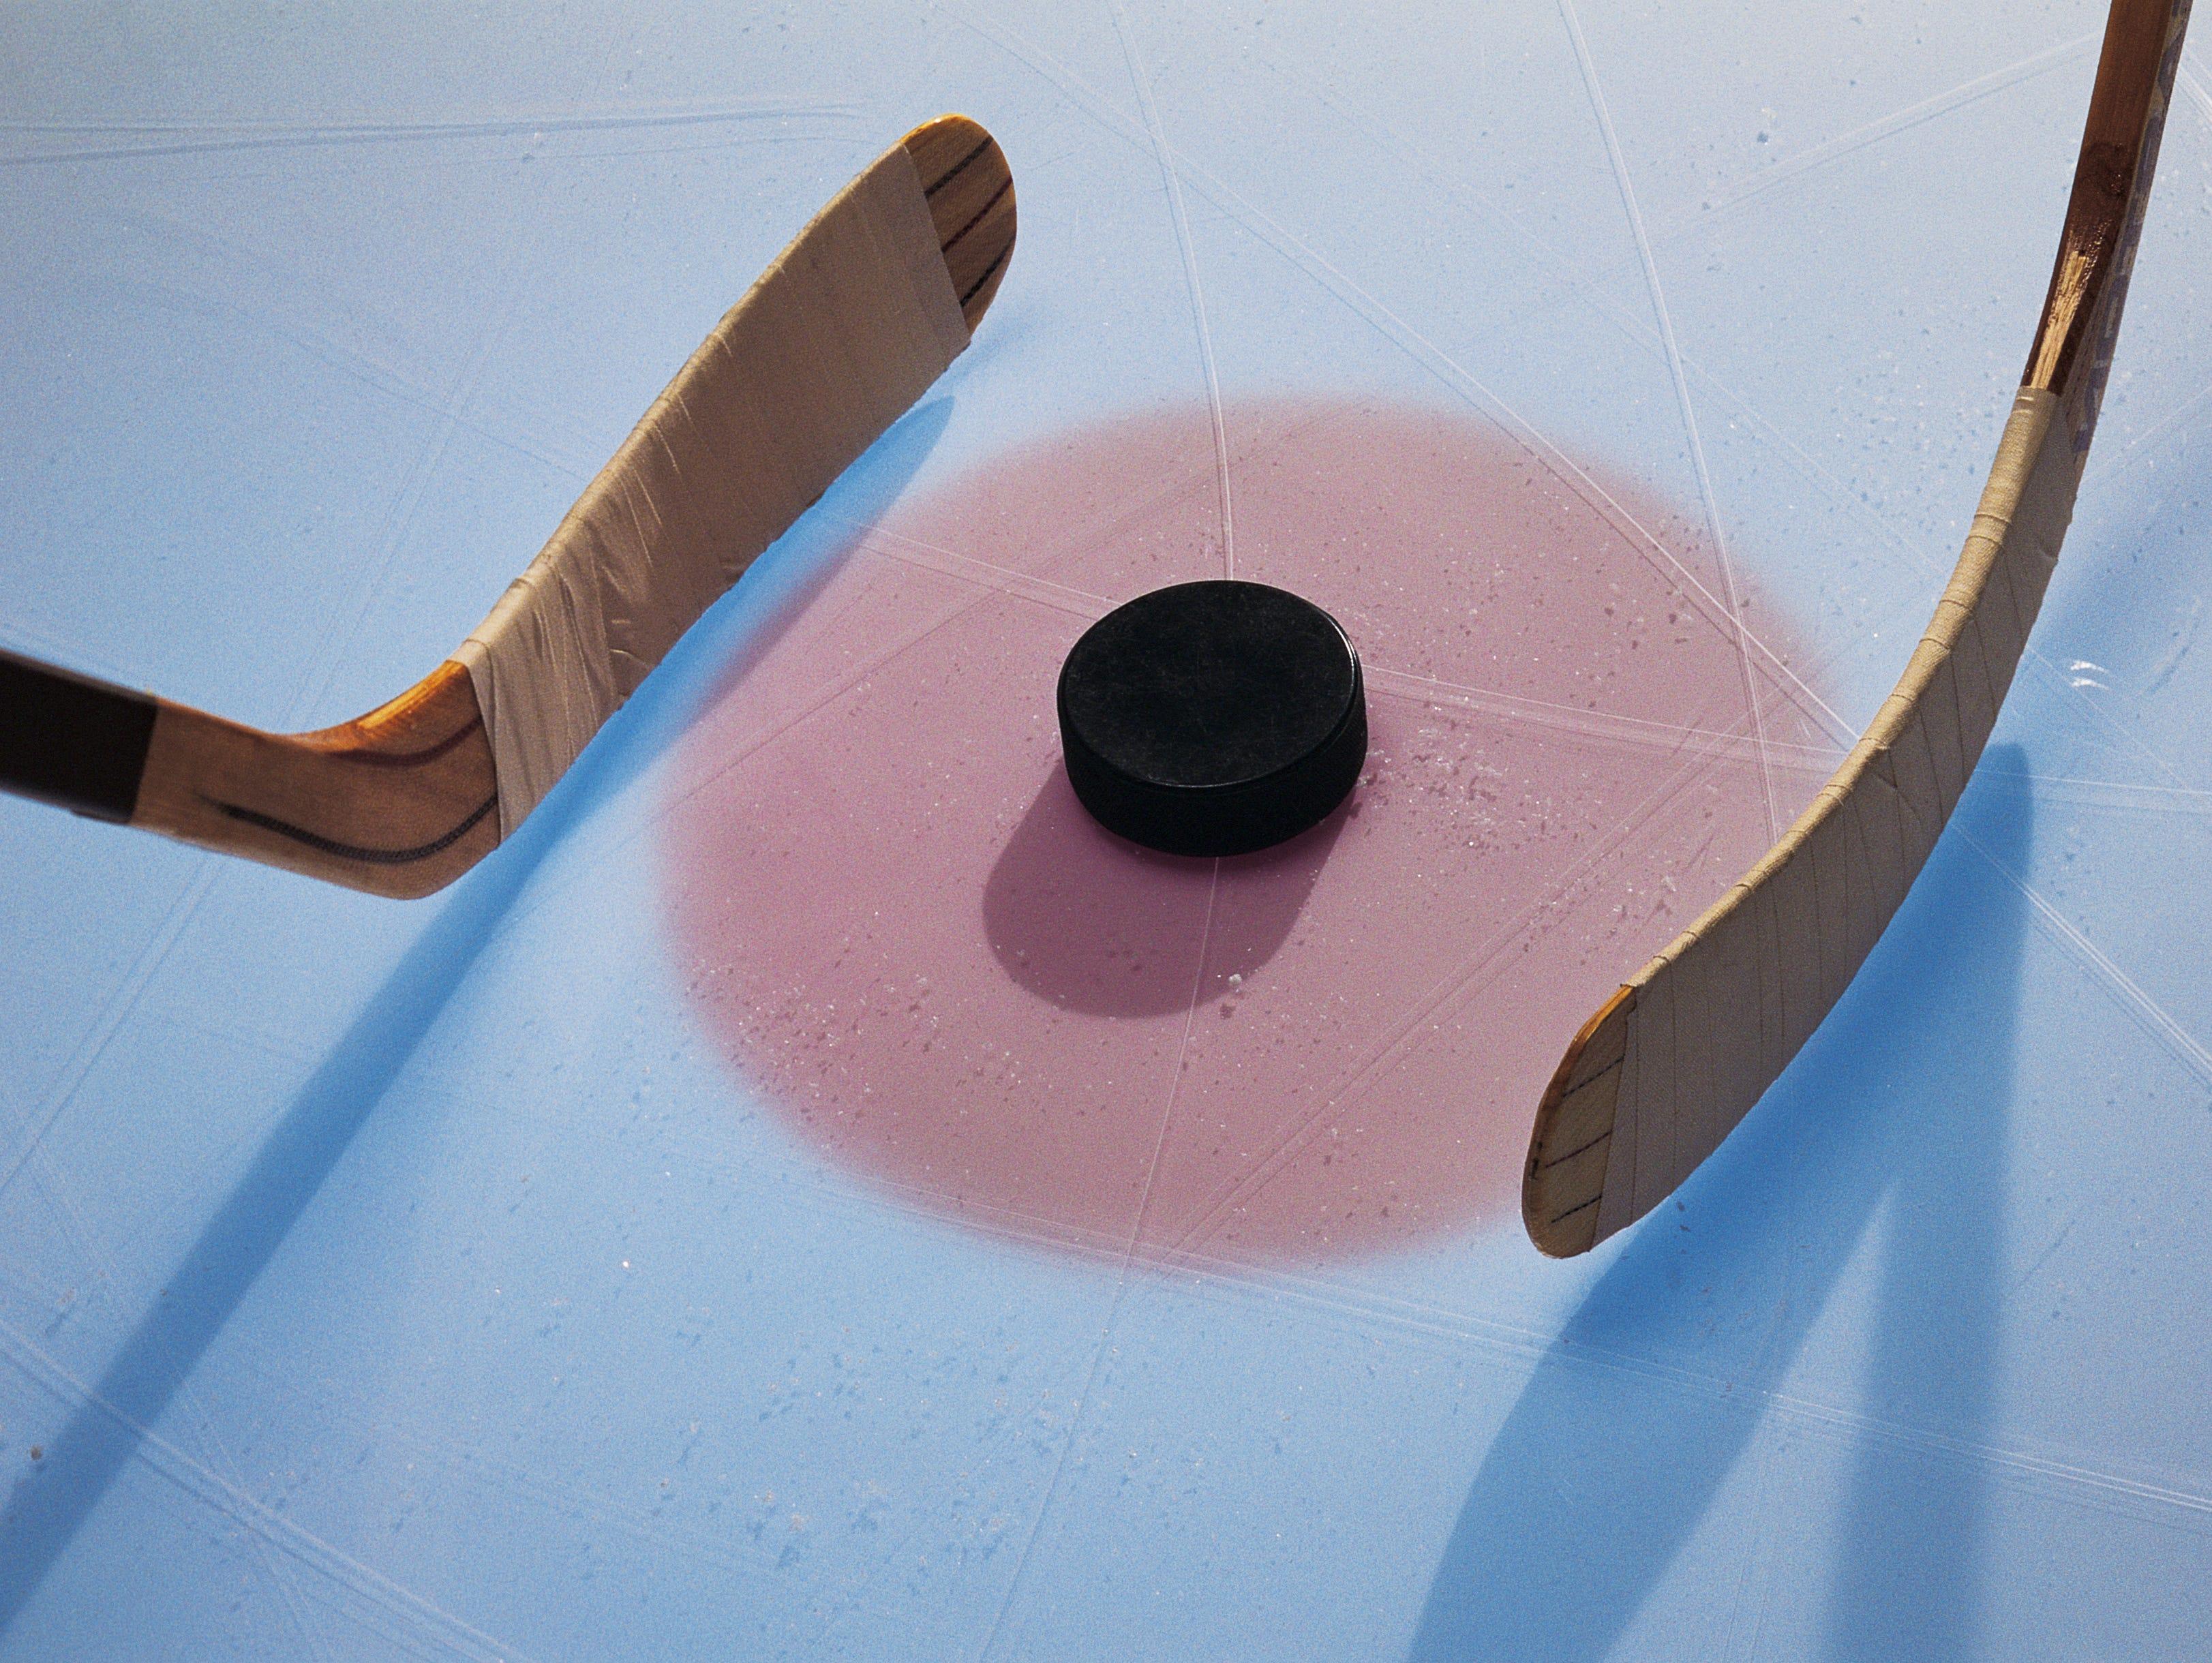 Ice hockey puck.